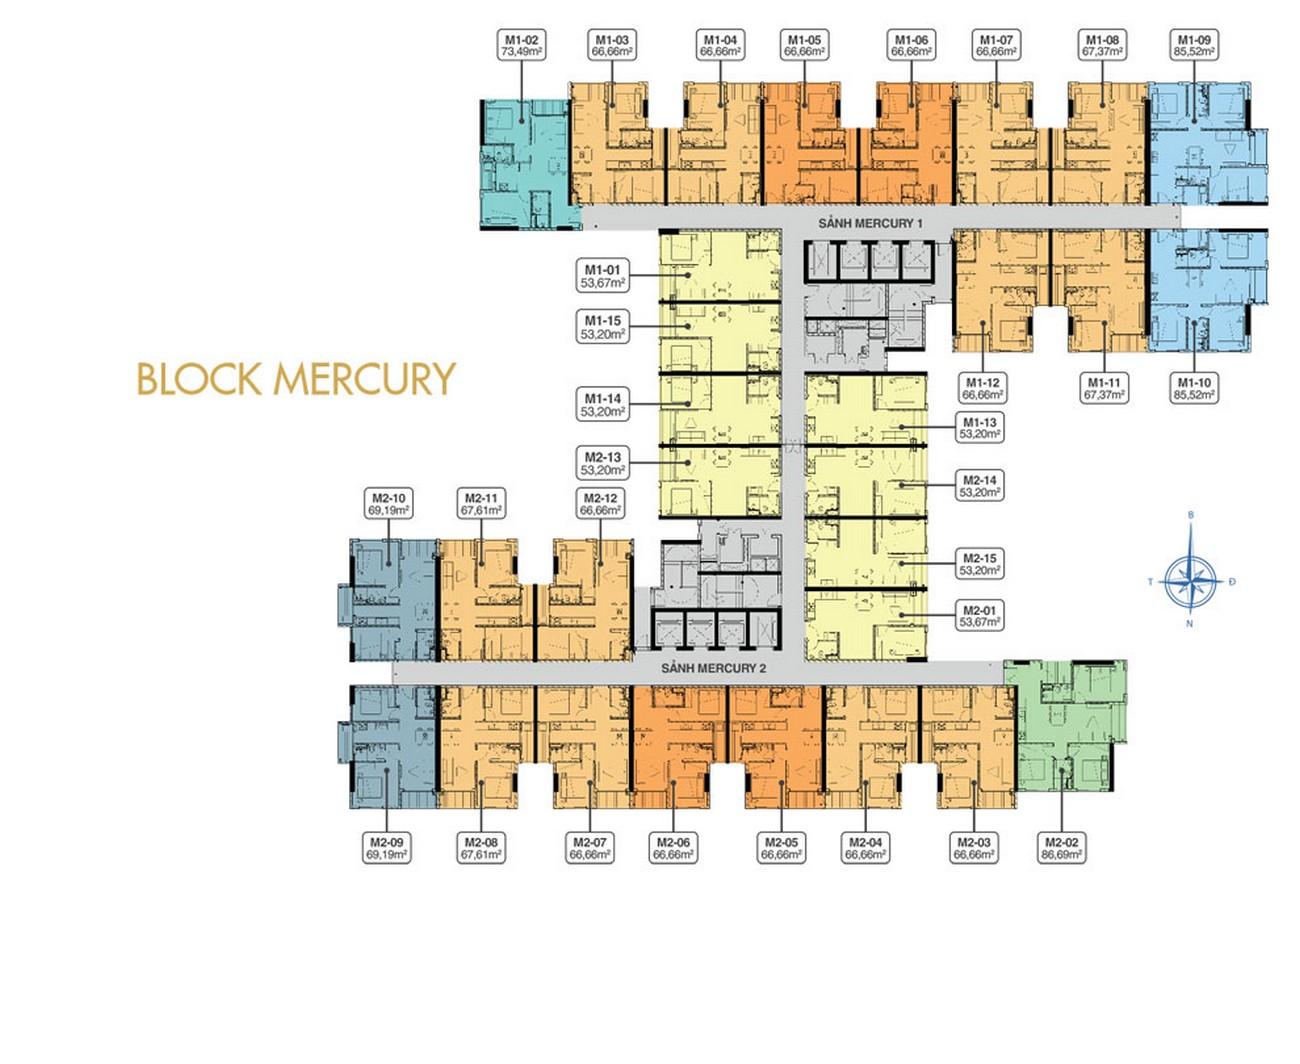 Mặt bằng tầng 05 Block Mercure Q7 Riverside Complex